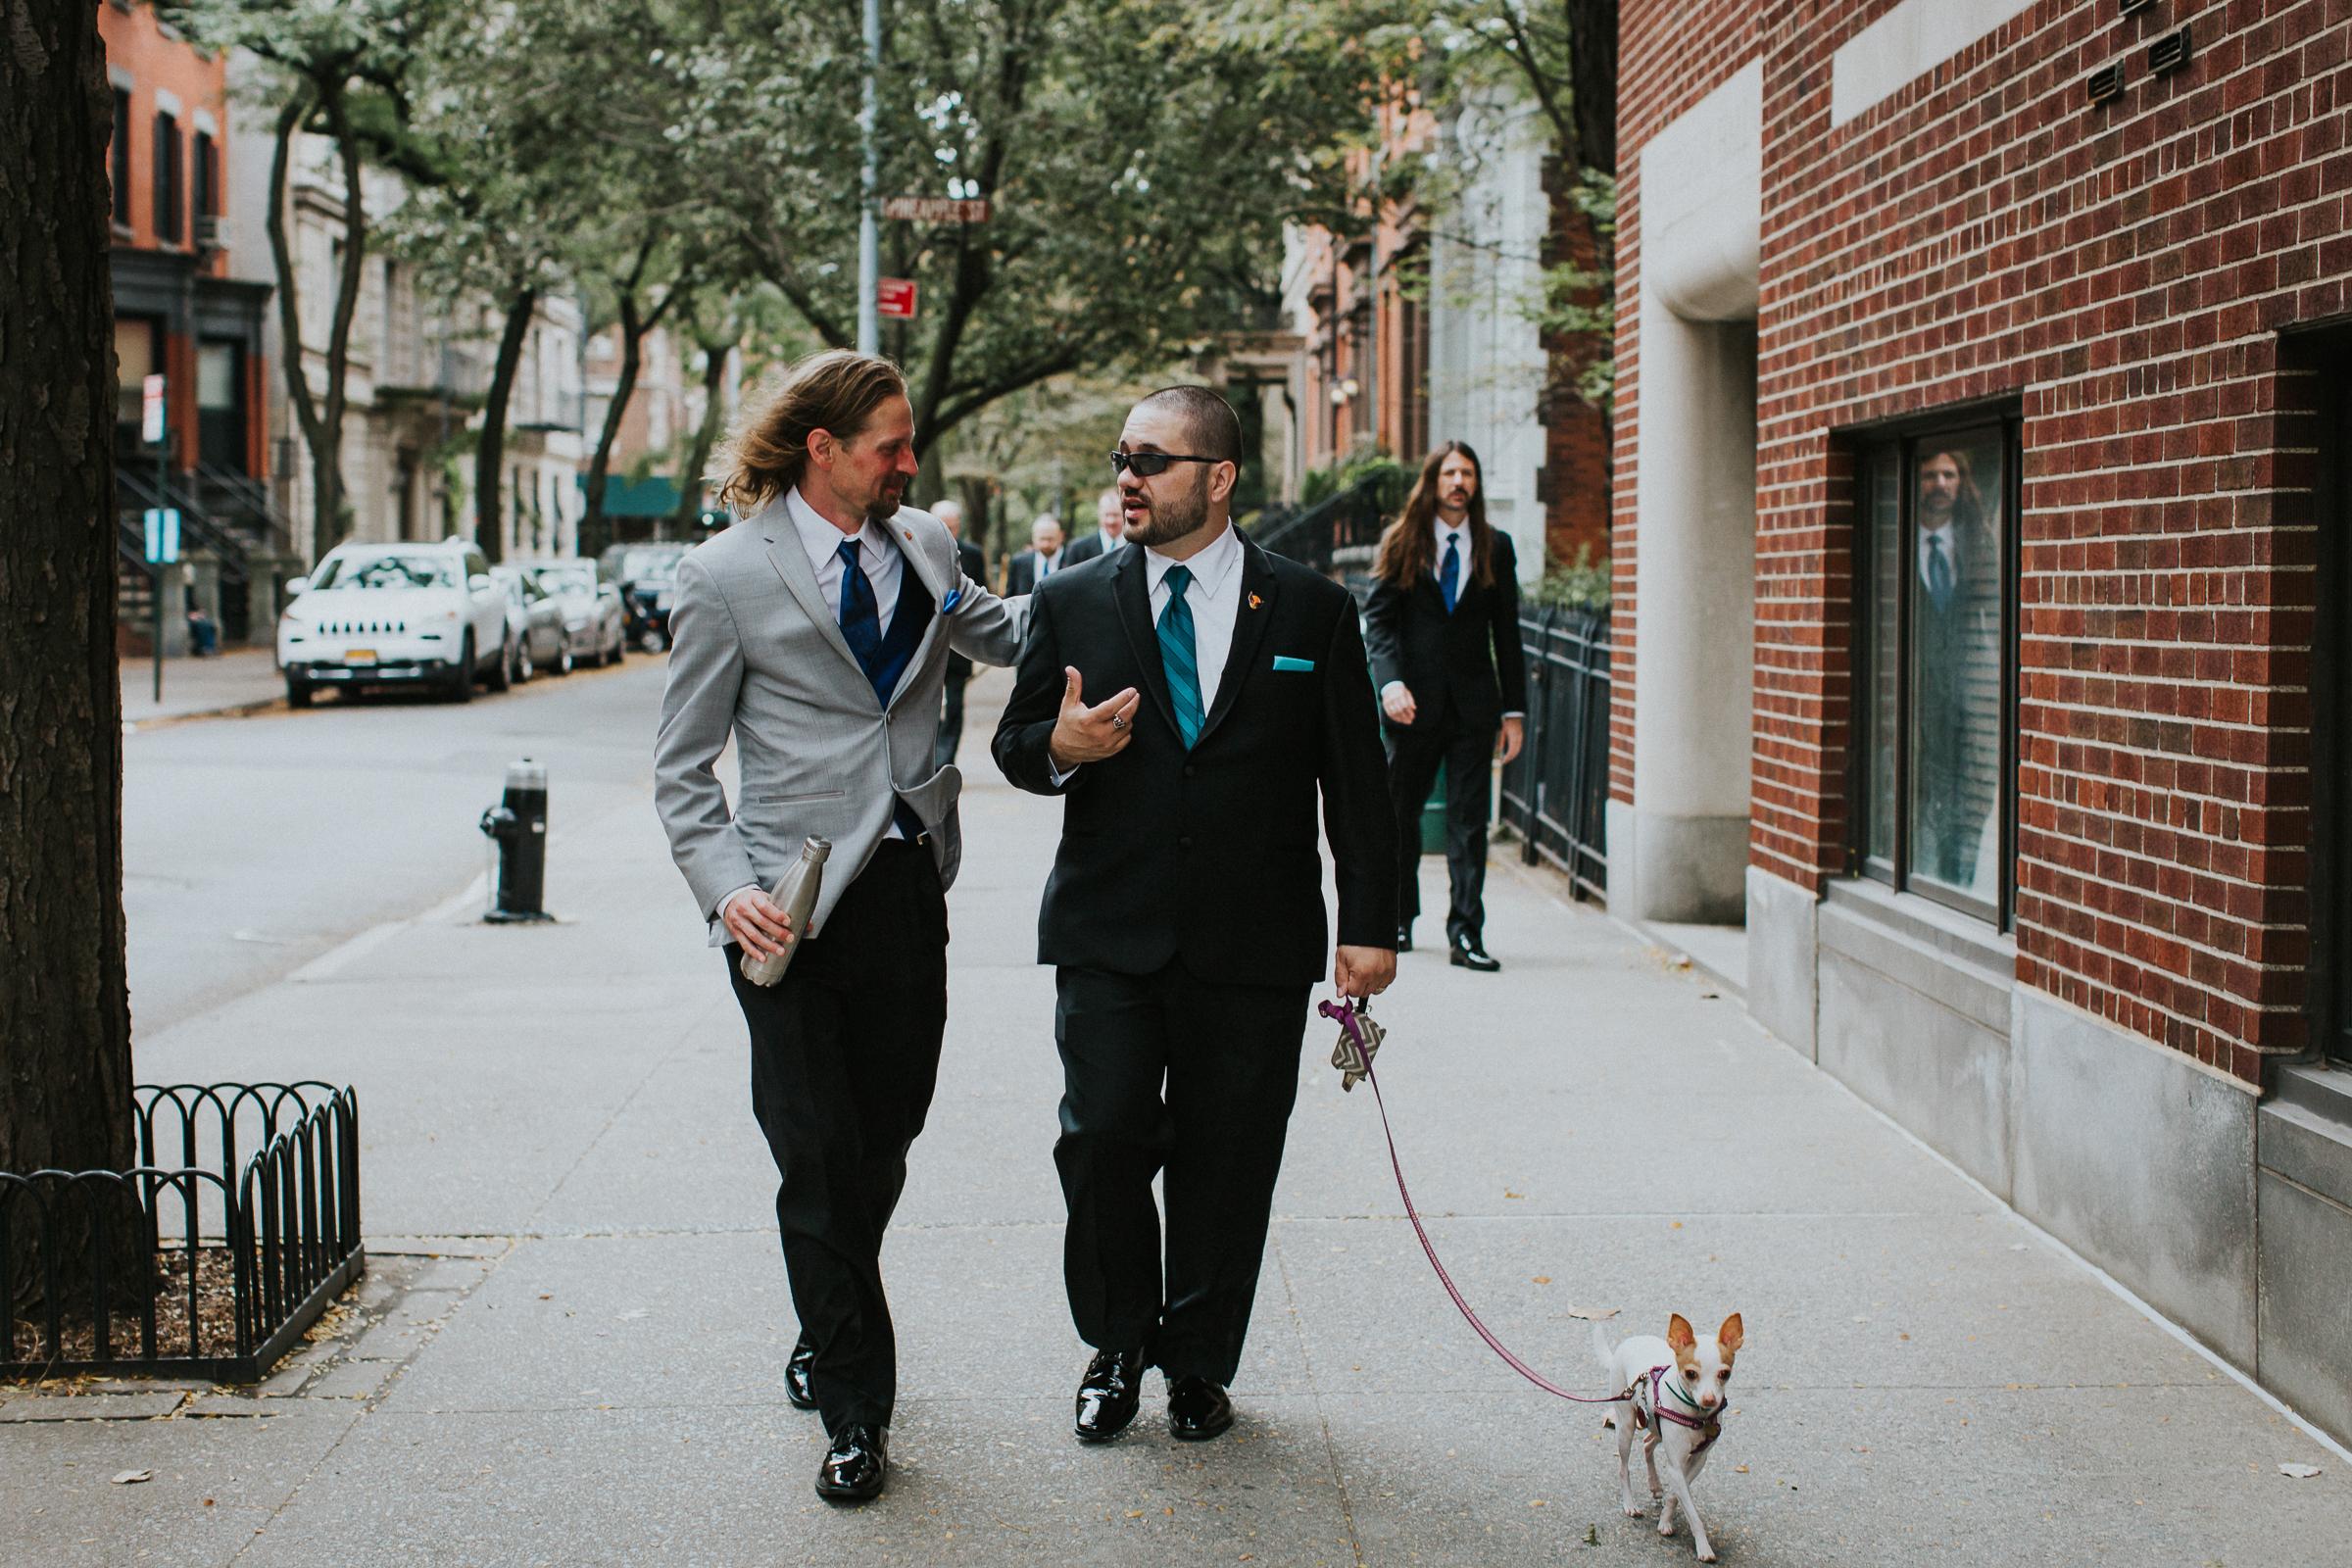 NYC-Brooklyn-Hotel-1-Botanic-Garden-Documentary-Wedding-Photographer-9.jpg